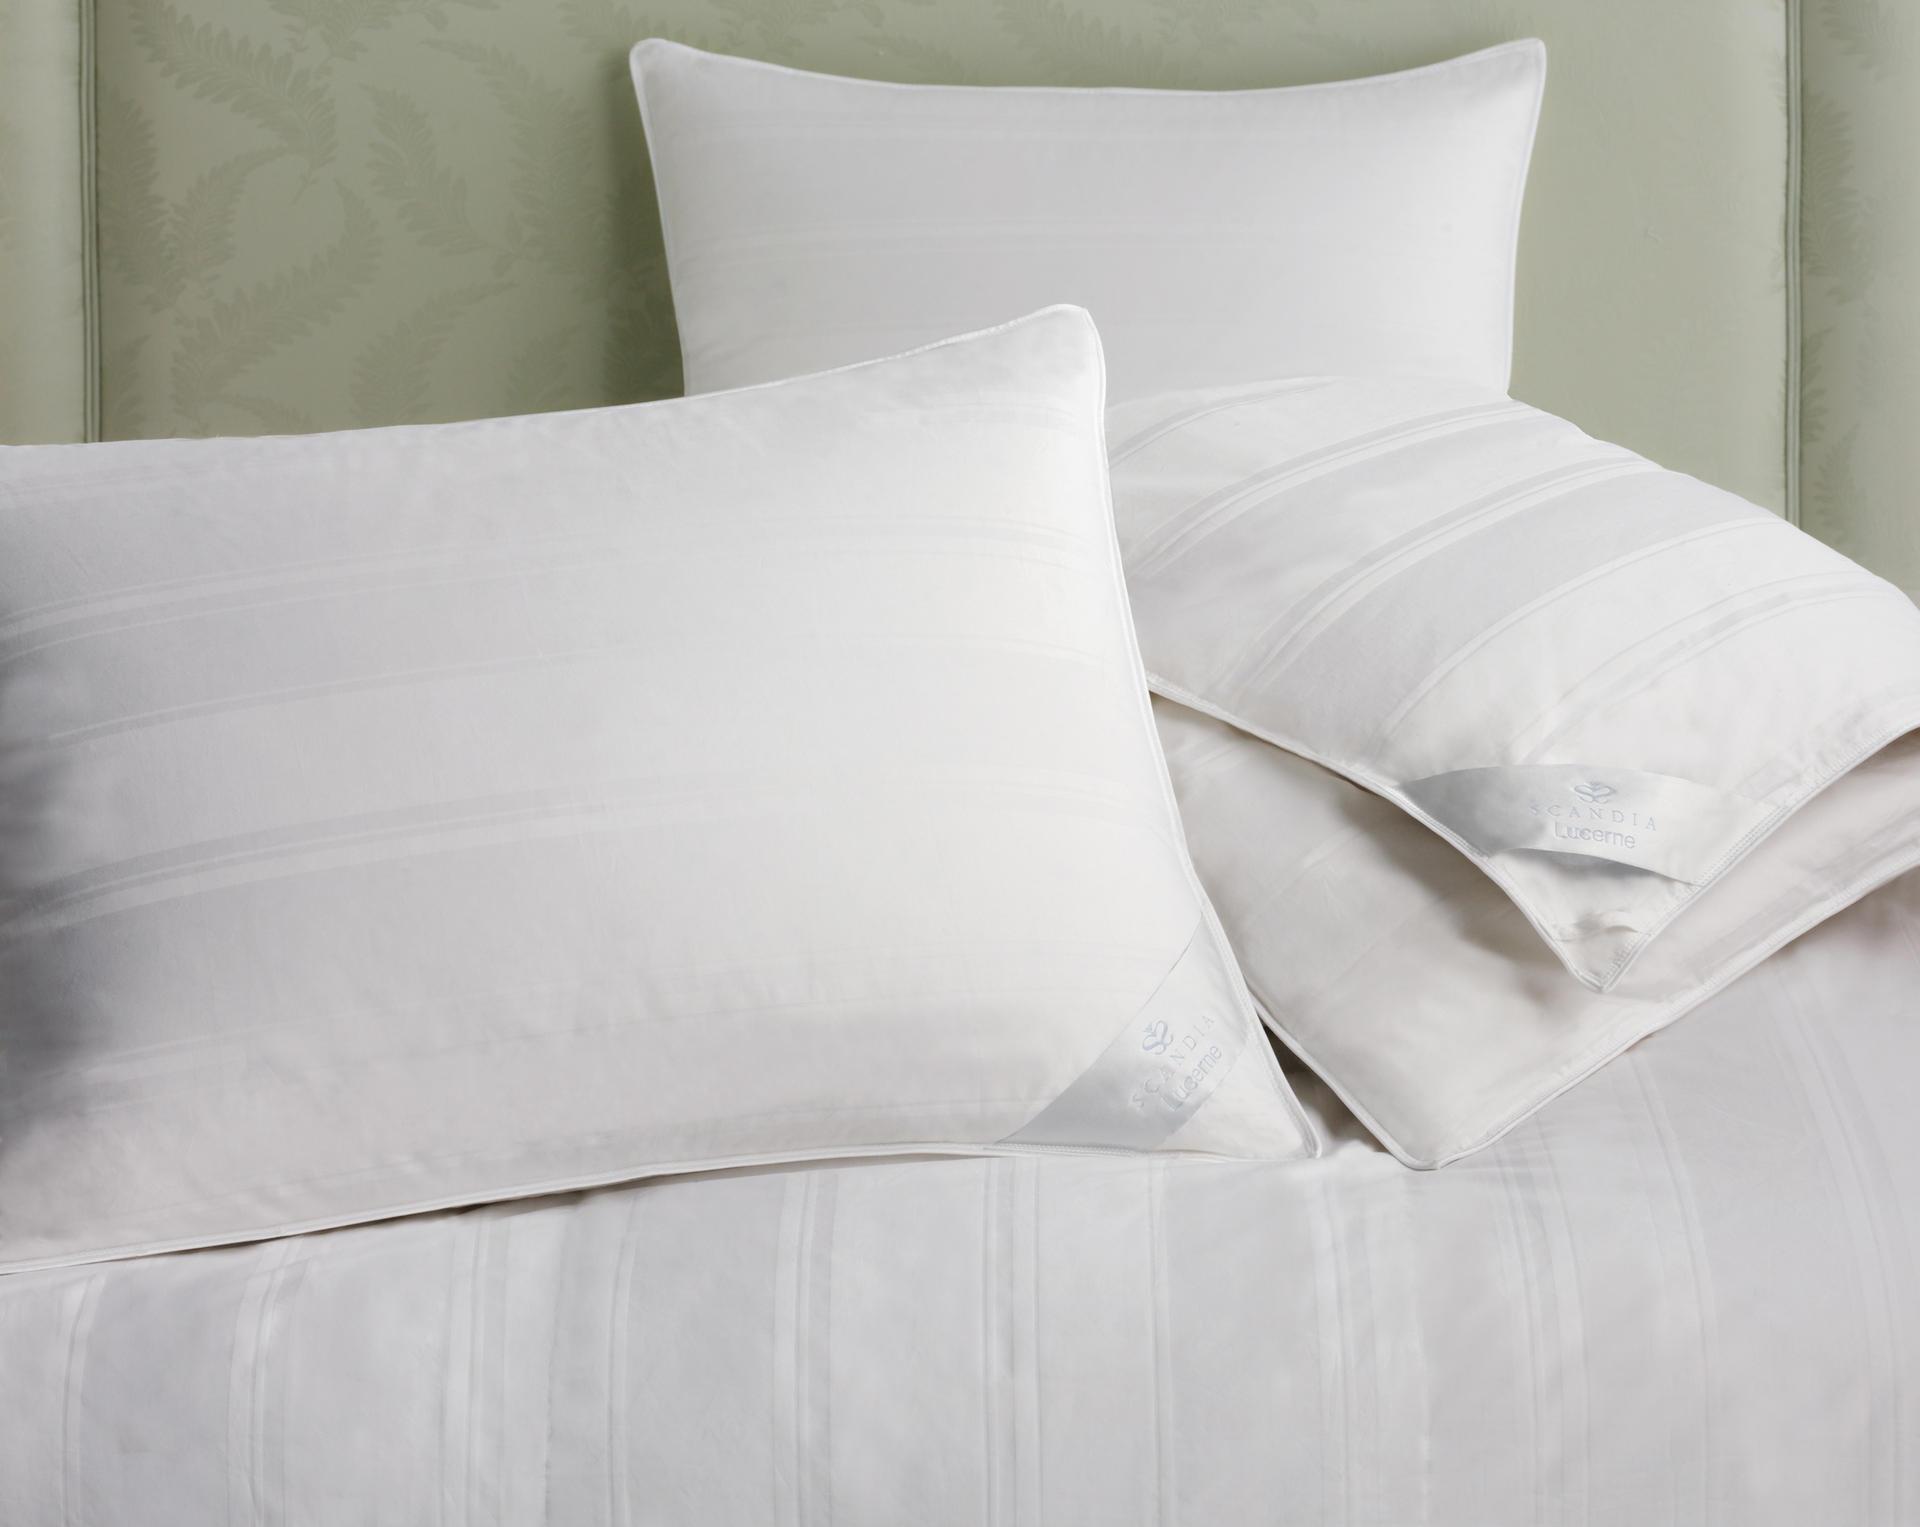 lucerne goose down pillow